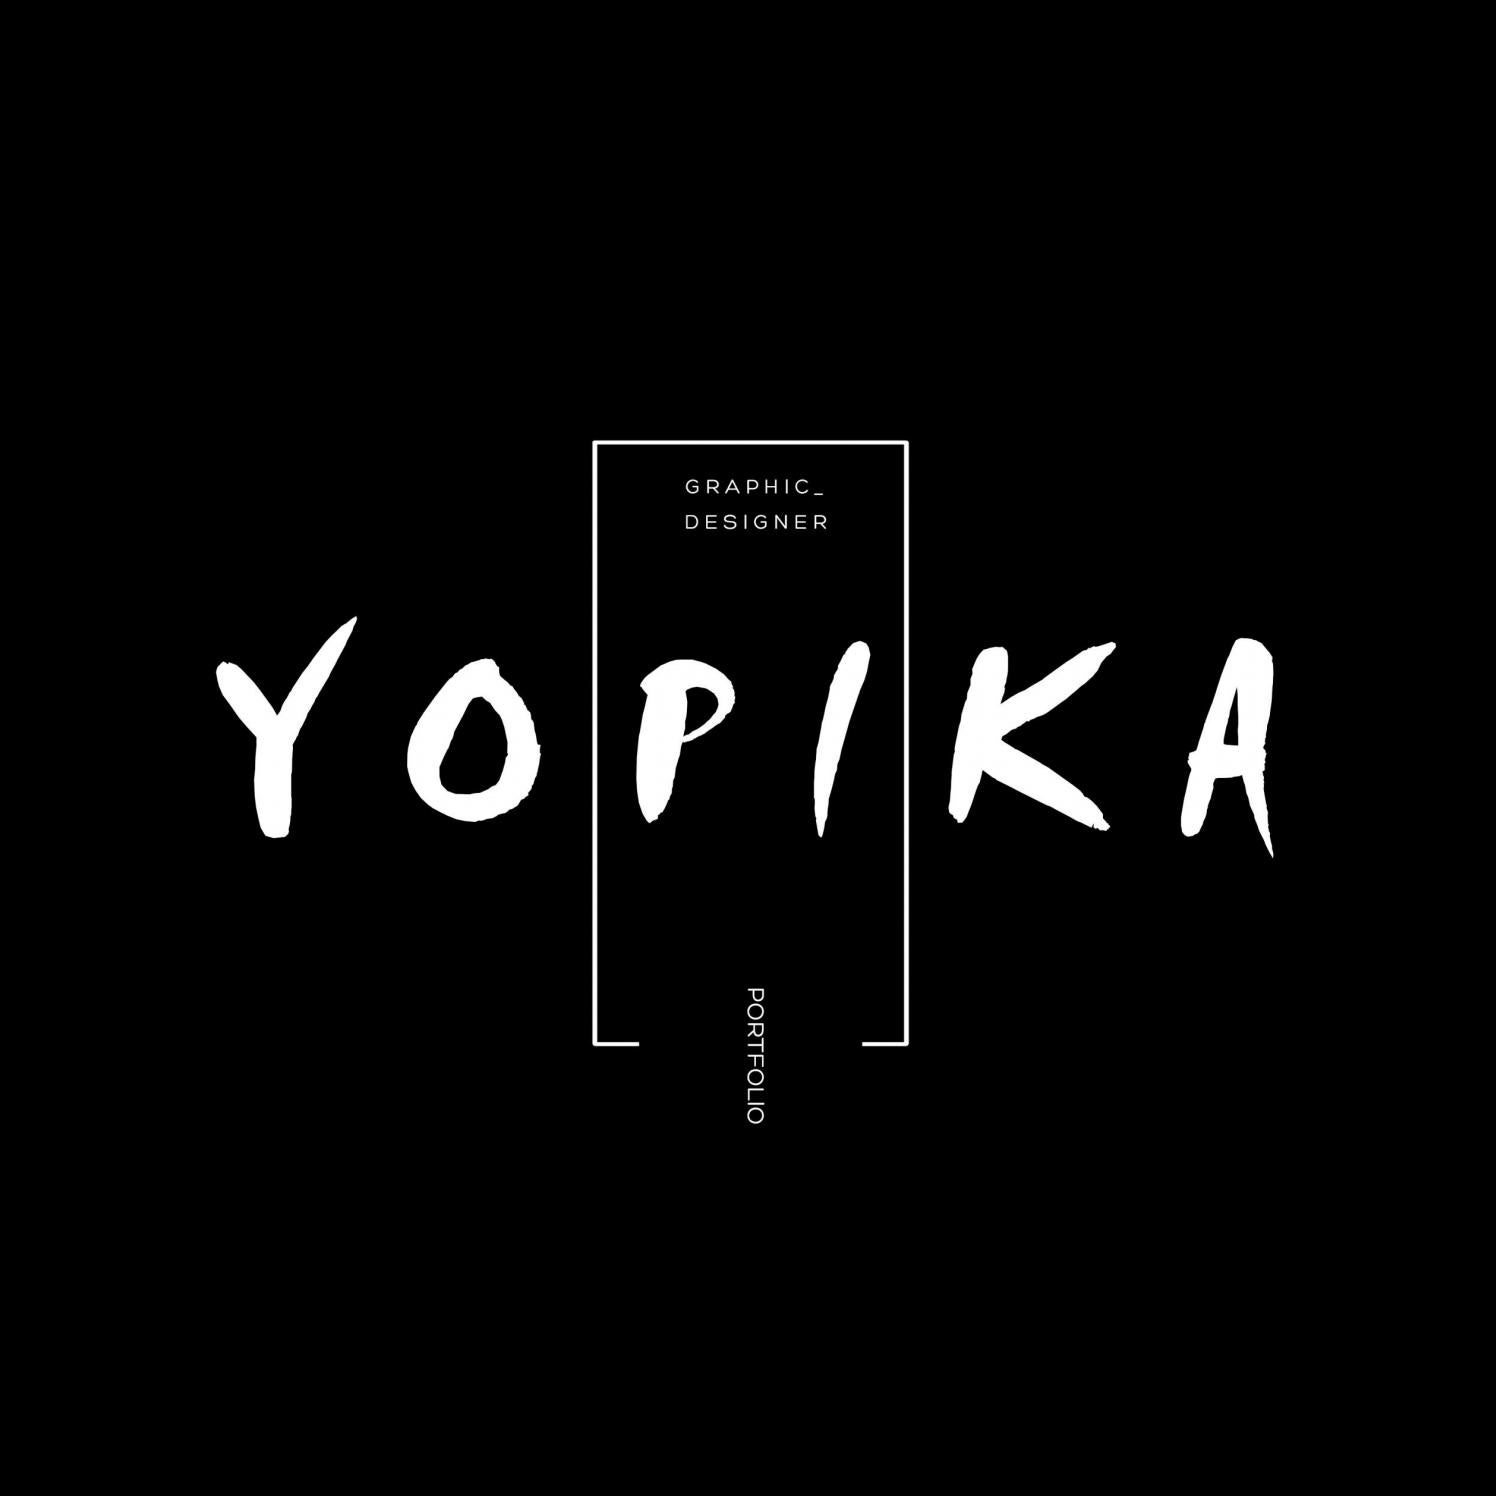 Yopika